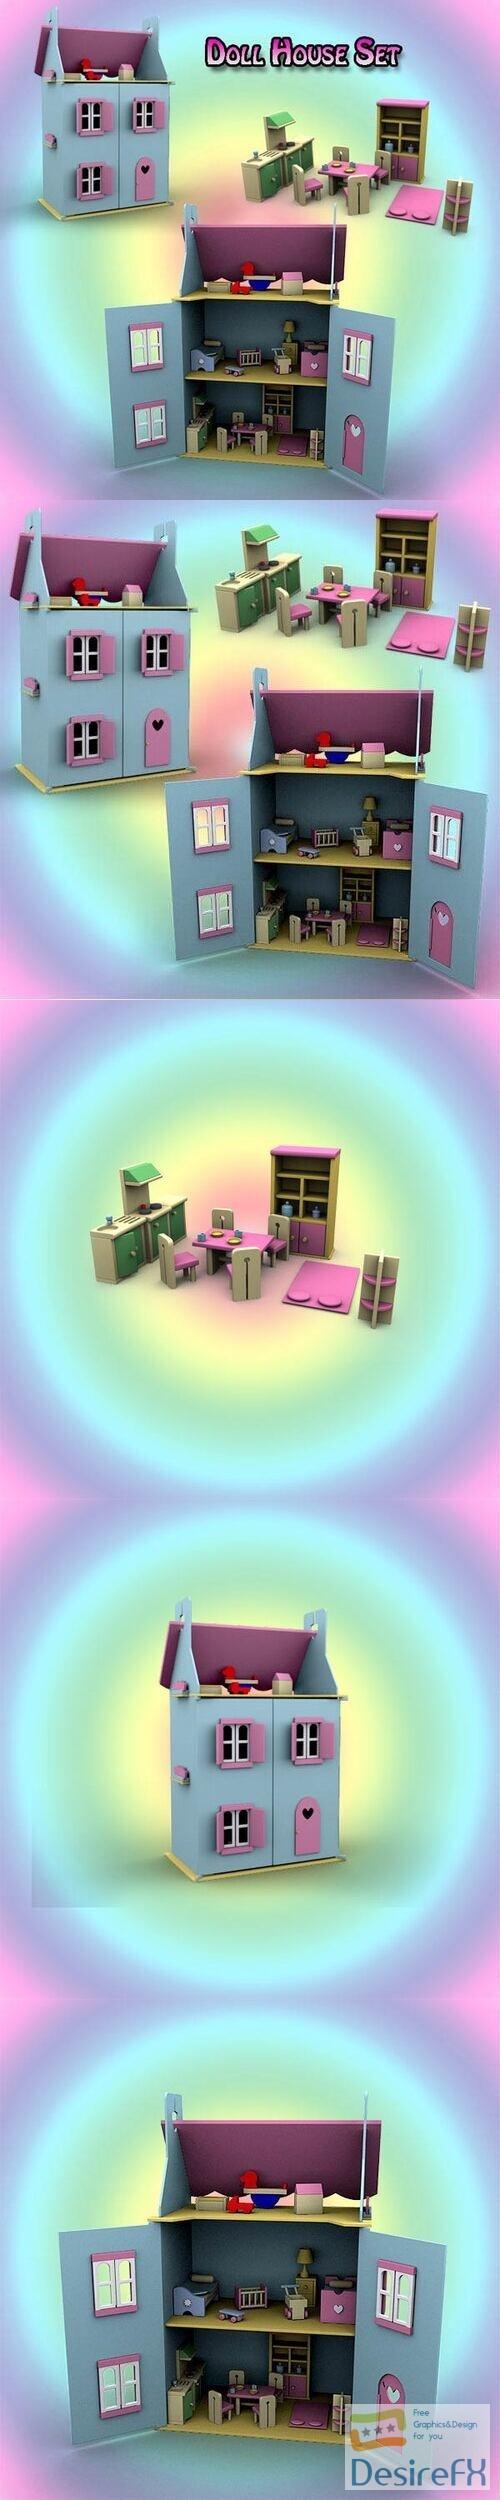 Doll House Set 01 3D Model